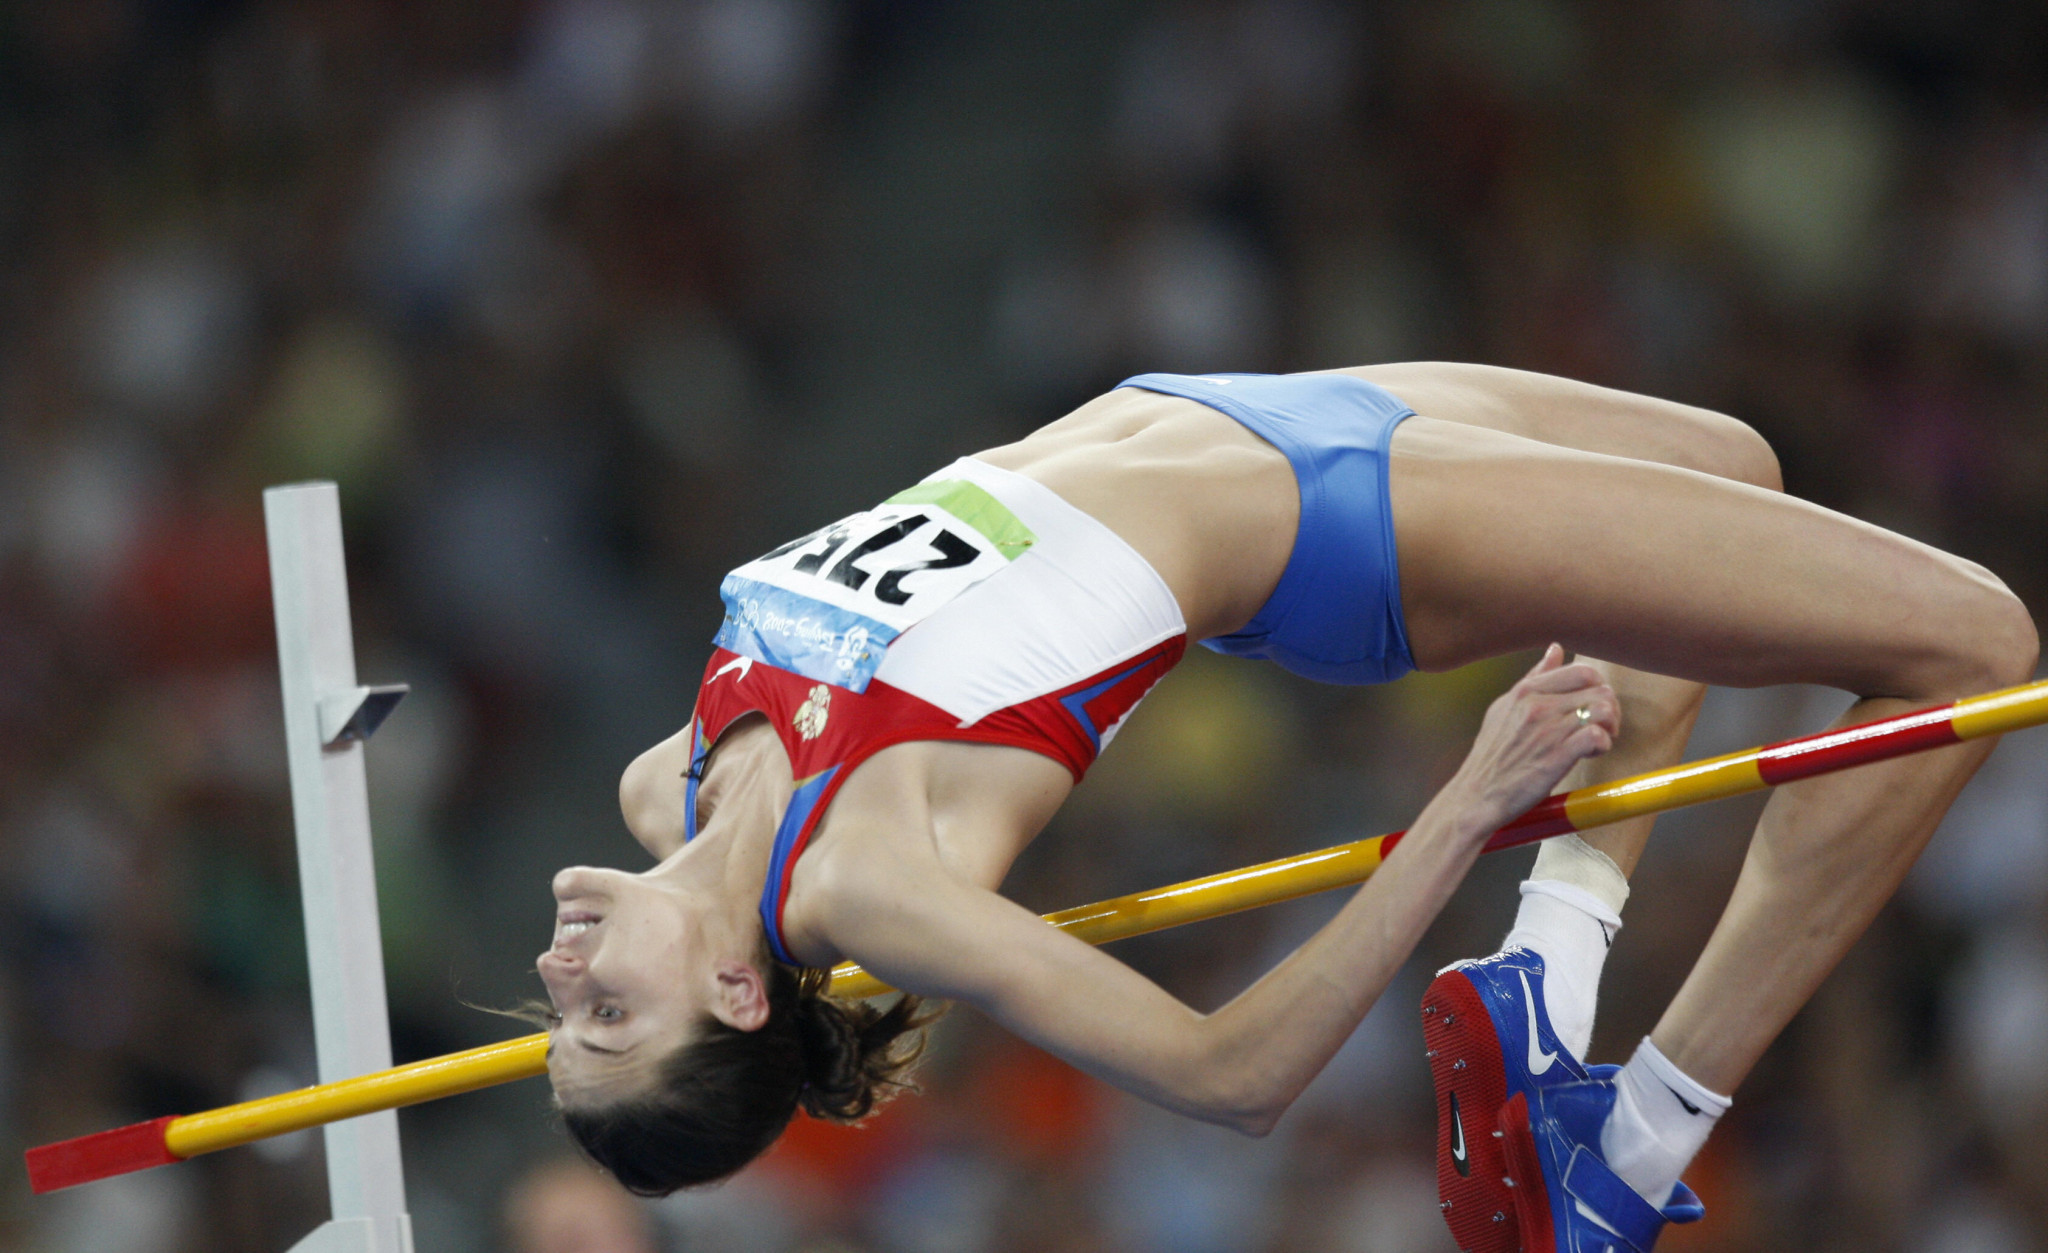 CAS dismiss Chicherova appeal against stripping of Beijing 2008 bronze medal